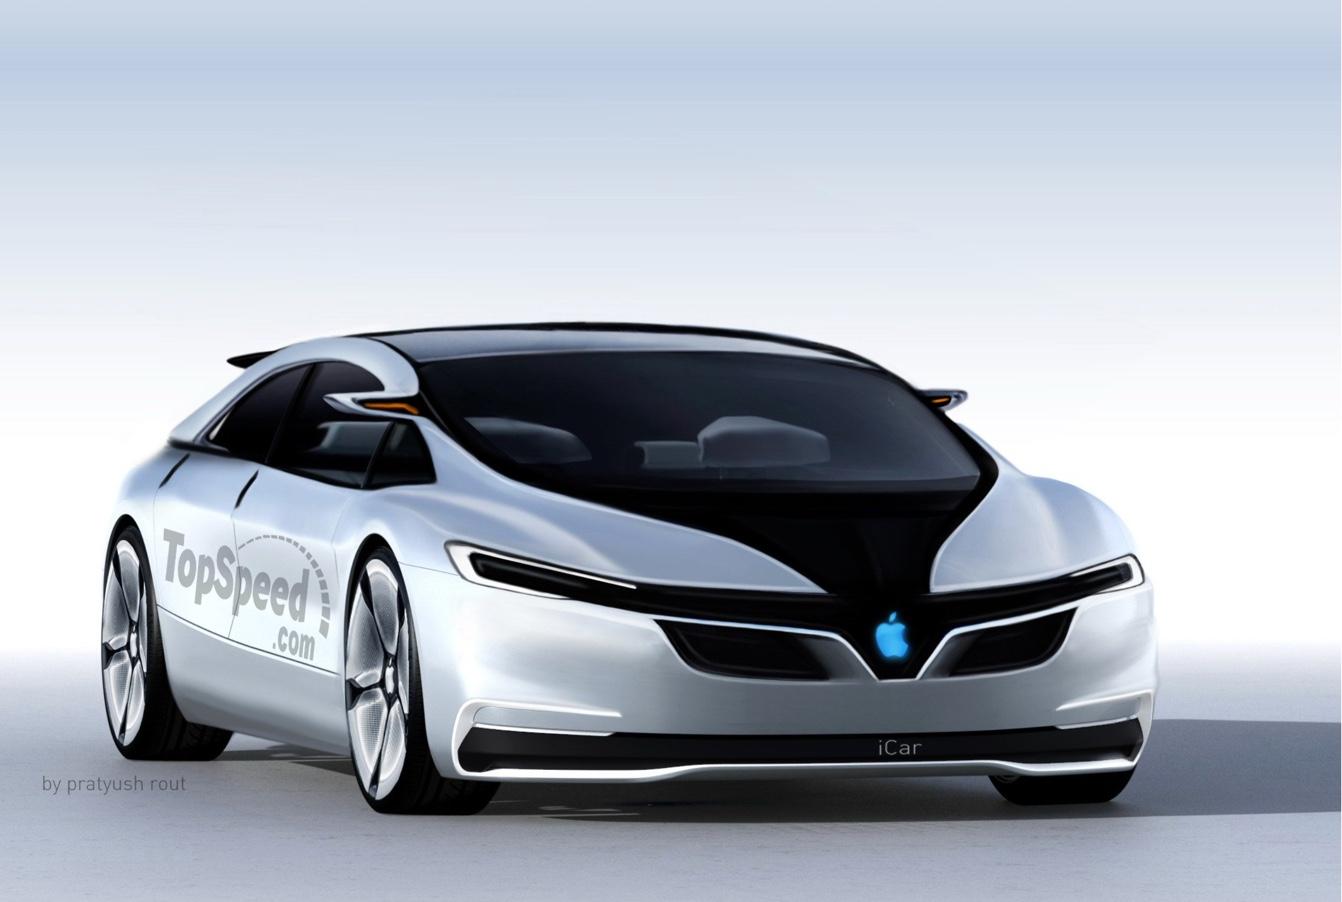 HyundaiとKia、「Apple Car」協議が終了したことを確認